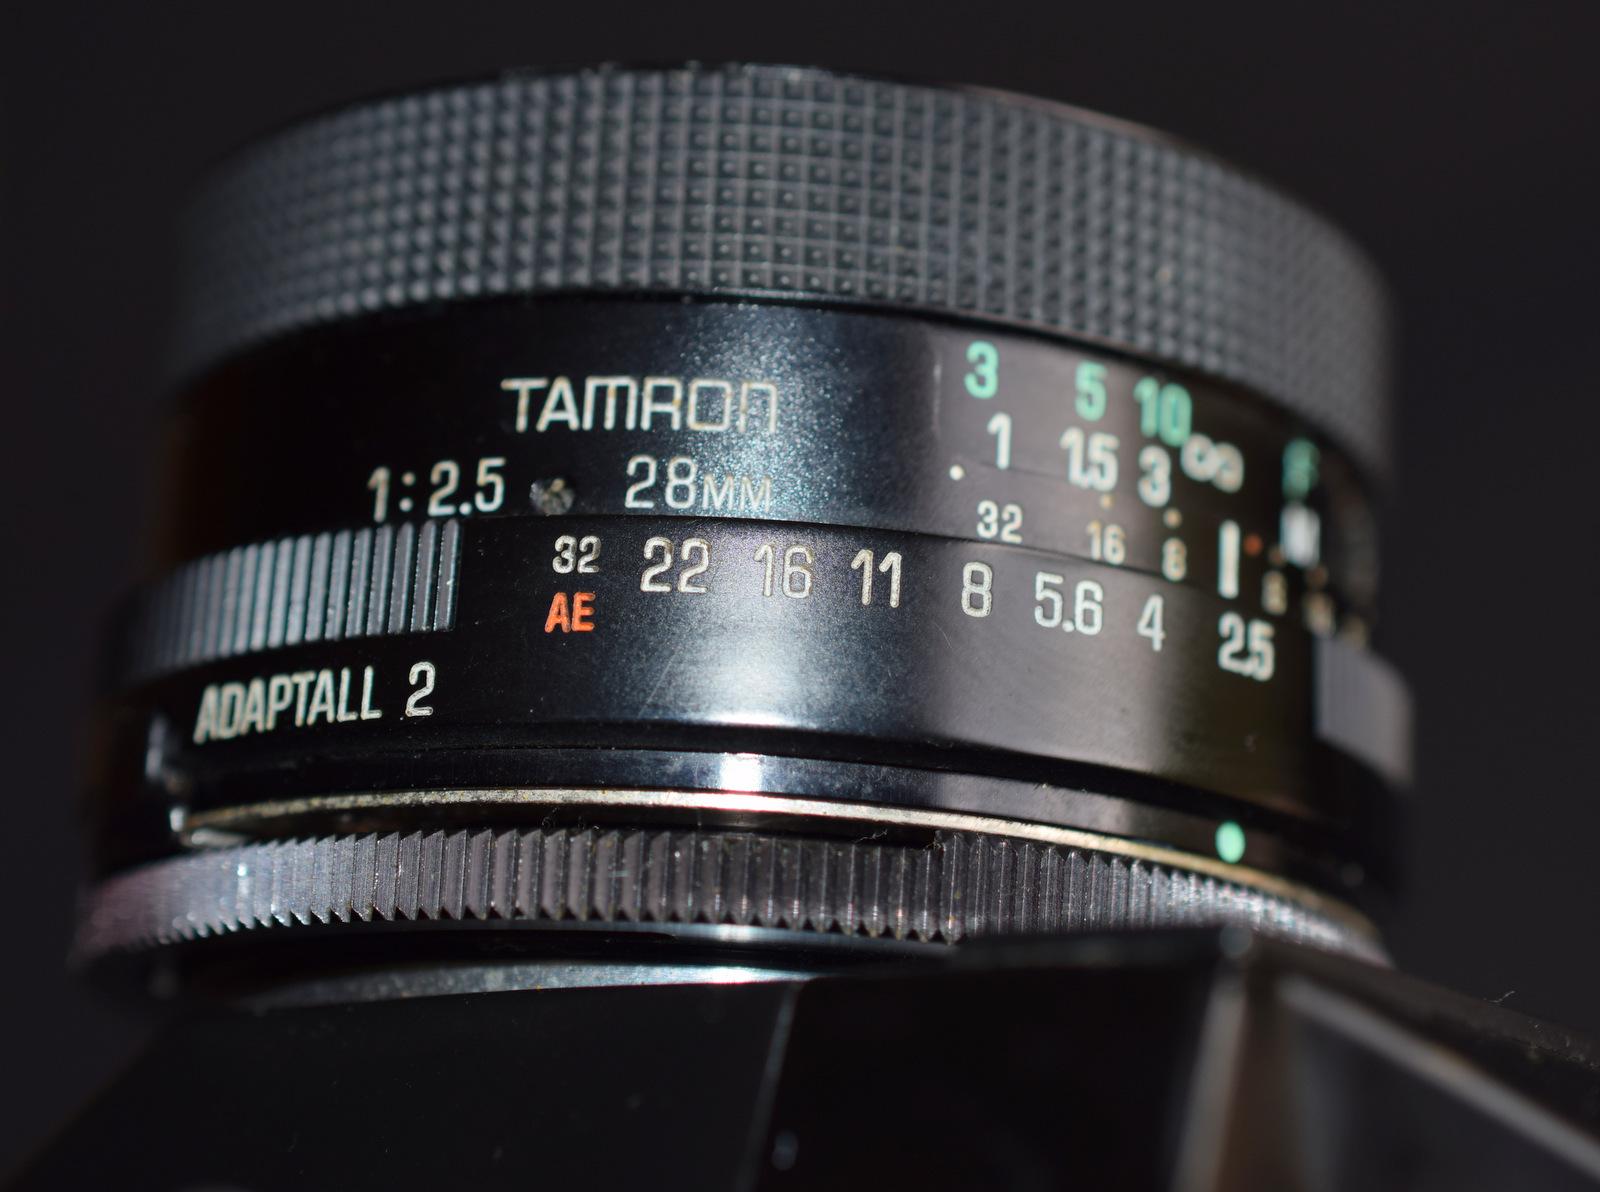 Lot 16 - Zenit EM 35mm Camera With Tamron 28mm 1:2.5